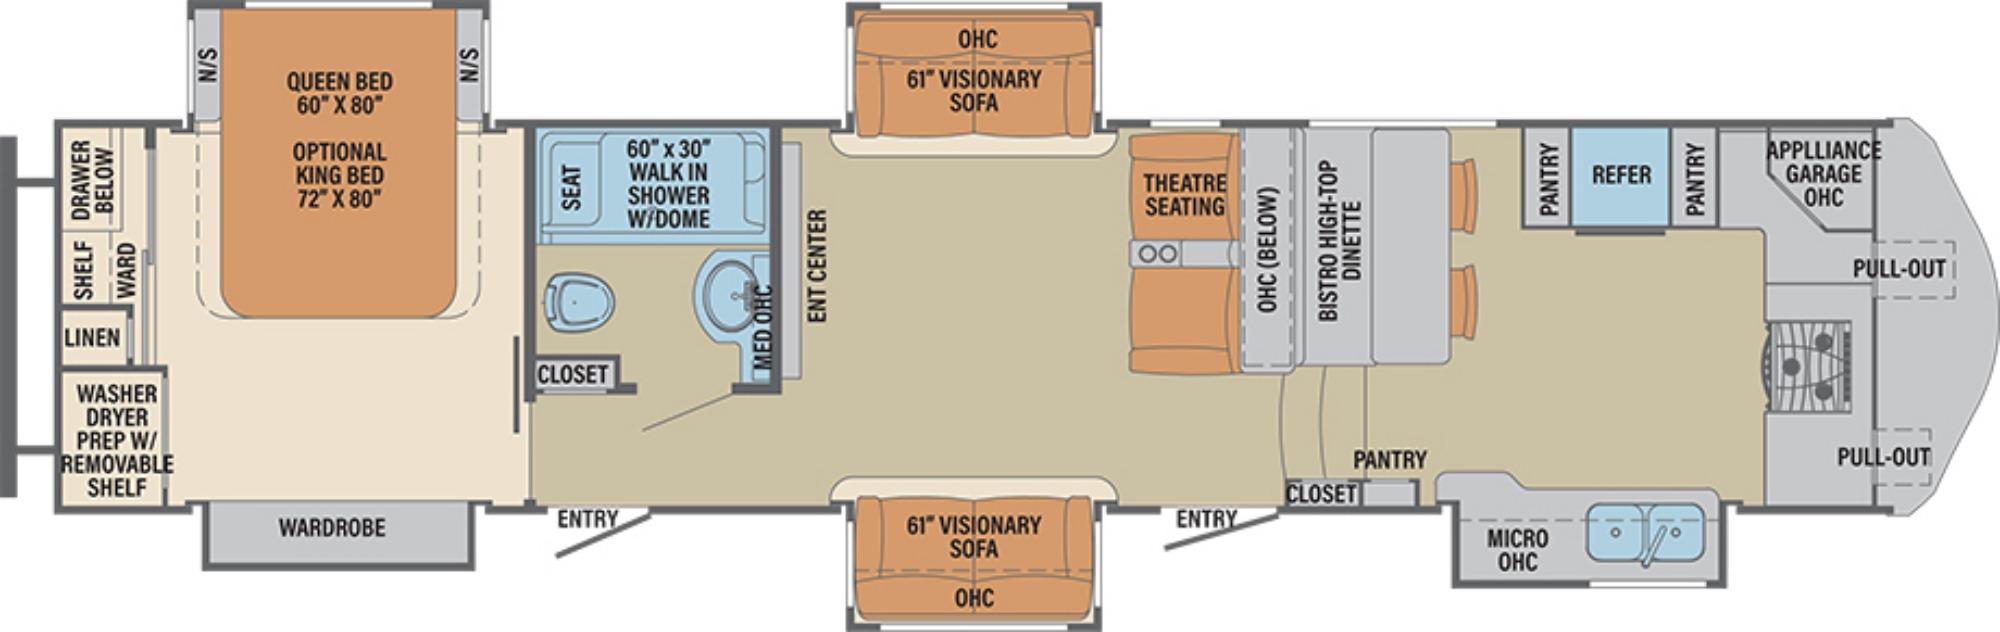 View Floor Plan for 2019 FOREST RIVER COLUMBUS 386FK